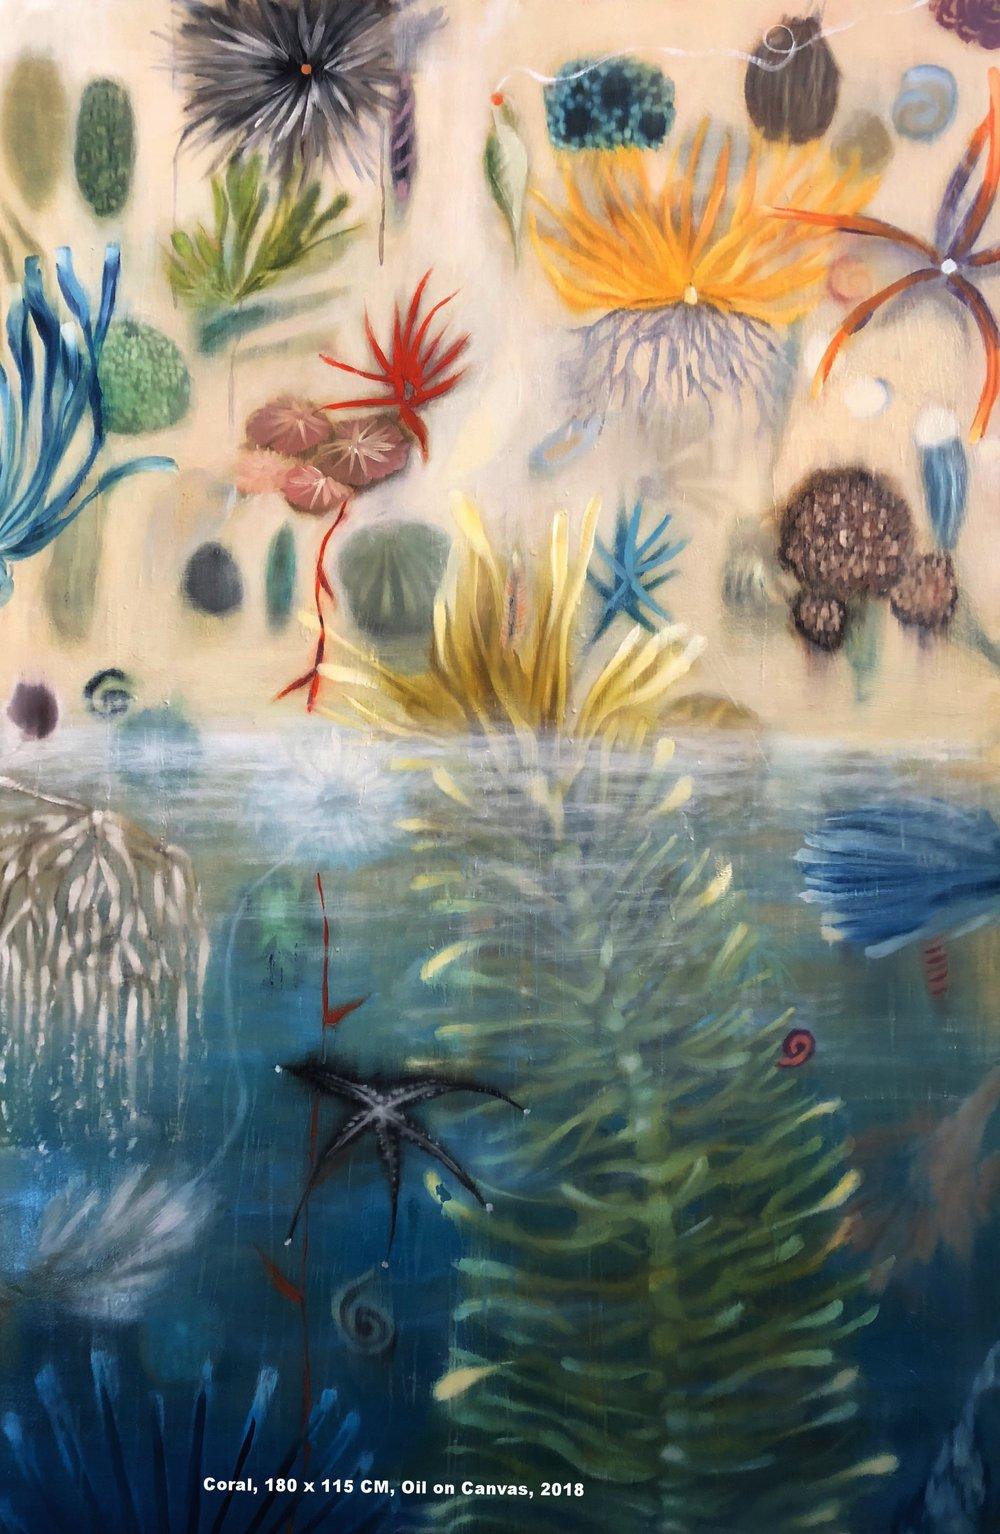 Coral, 180 x 115 CM, Oil on Canvas, 2018.jpg